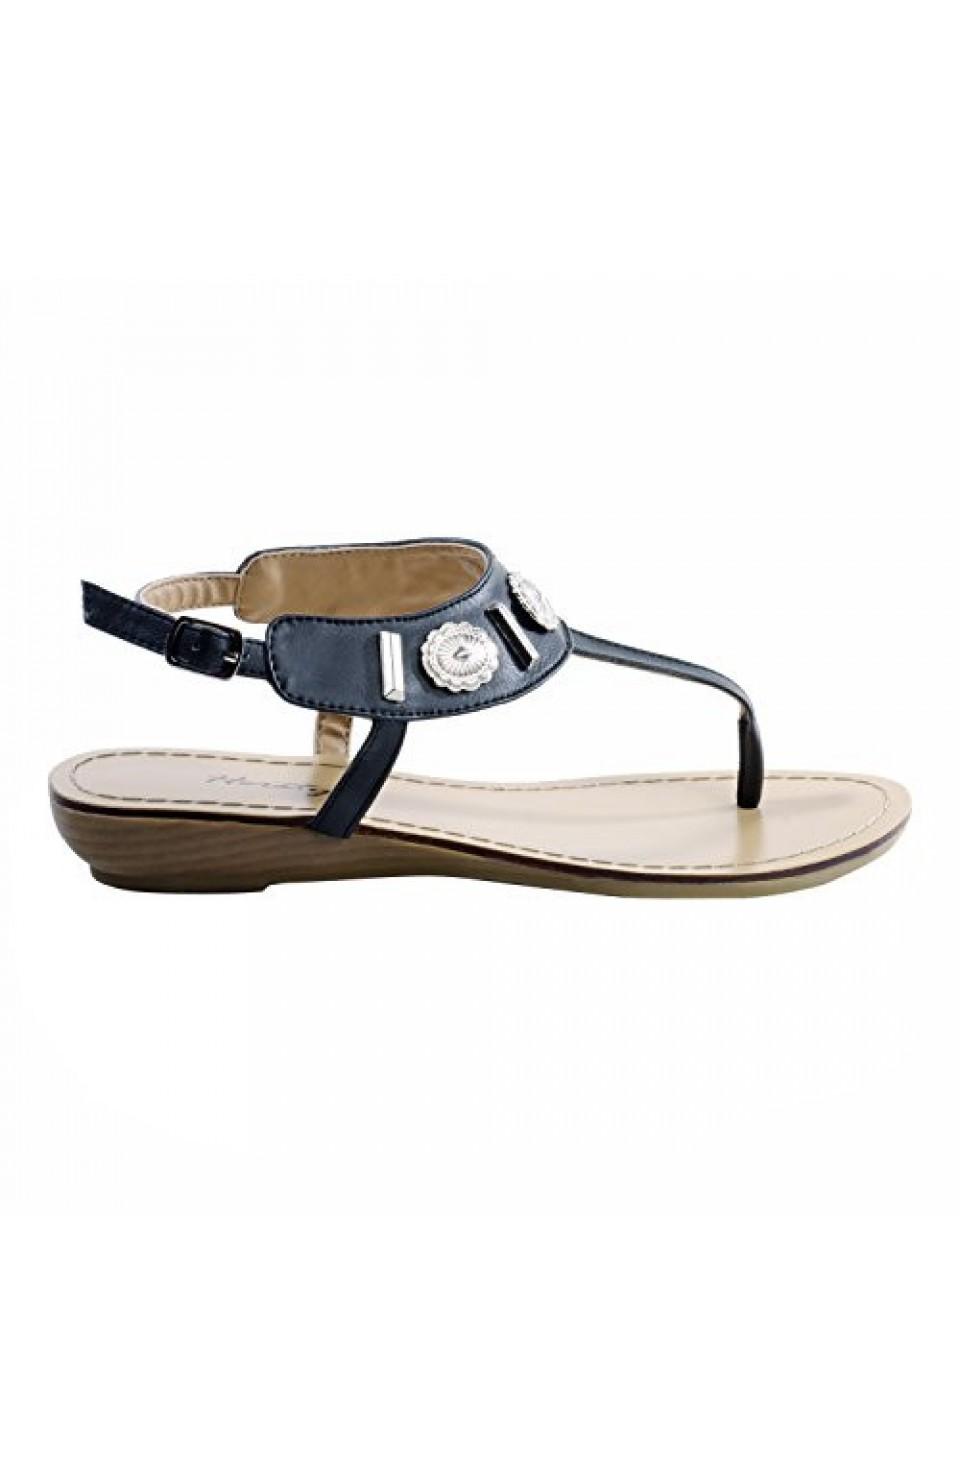 Women's Black Veranda Manmade Flat Sandal with Flirty Metallic Accents